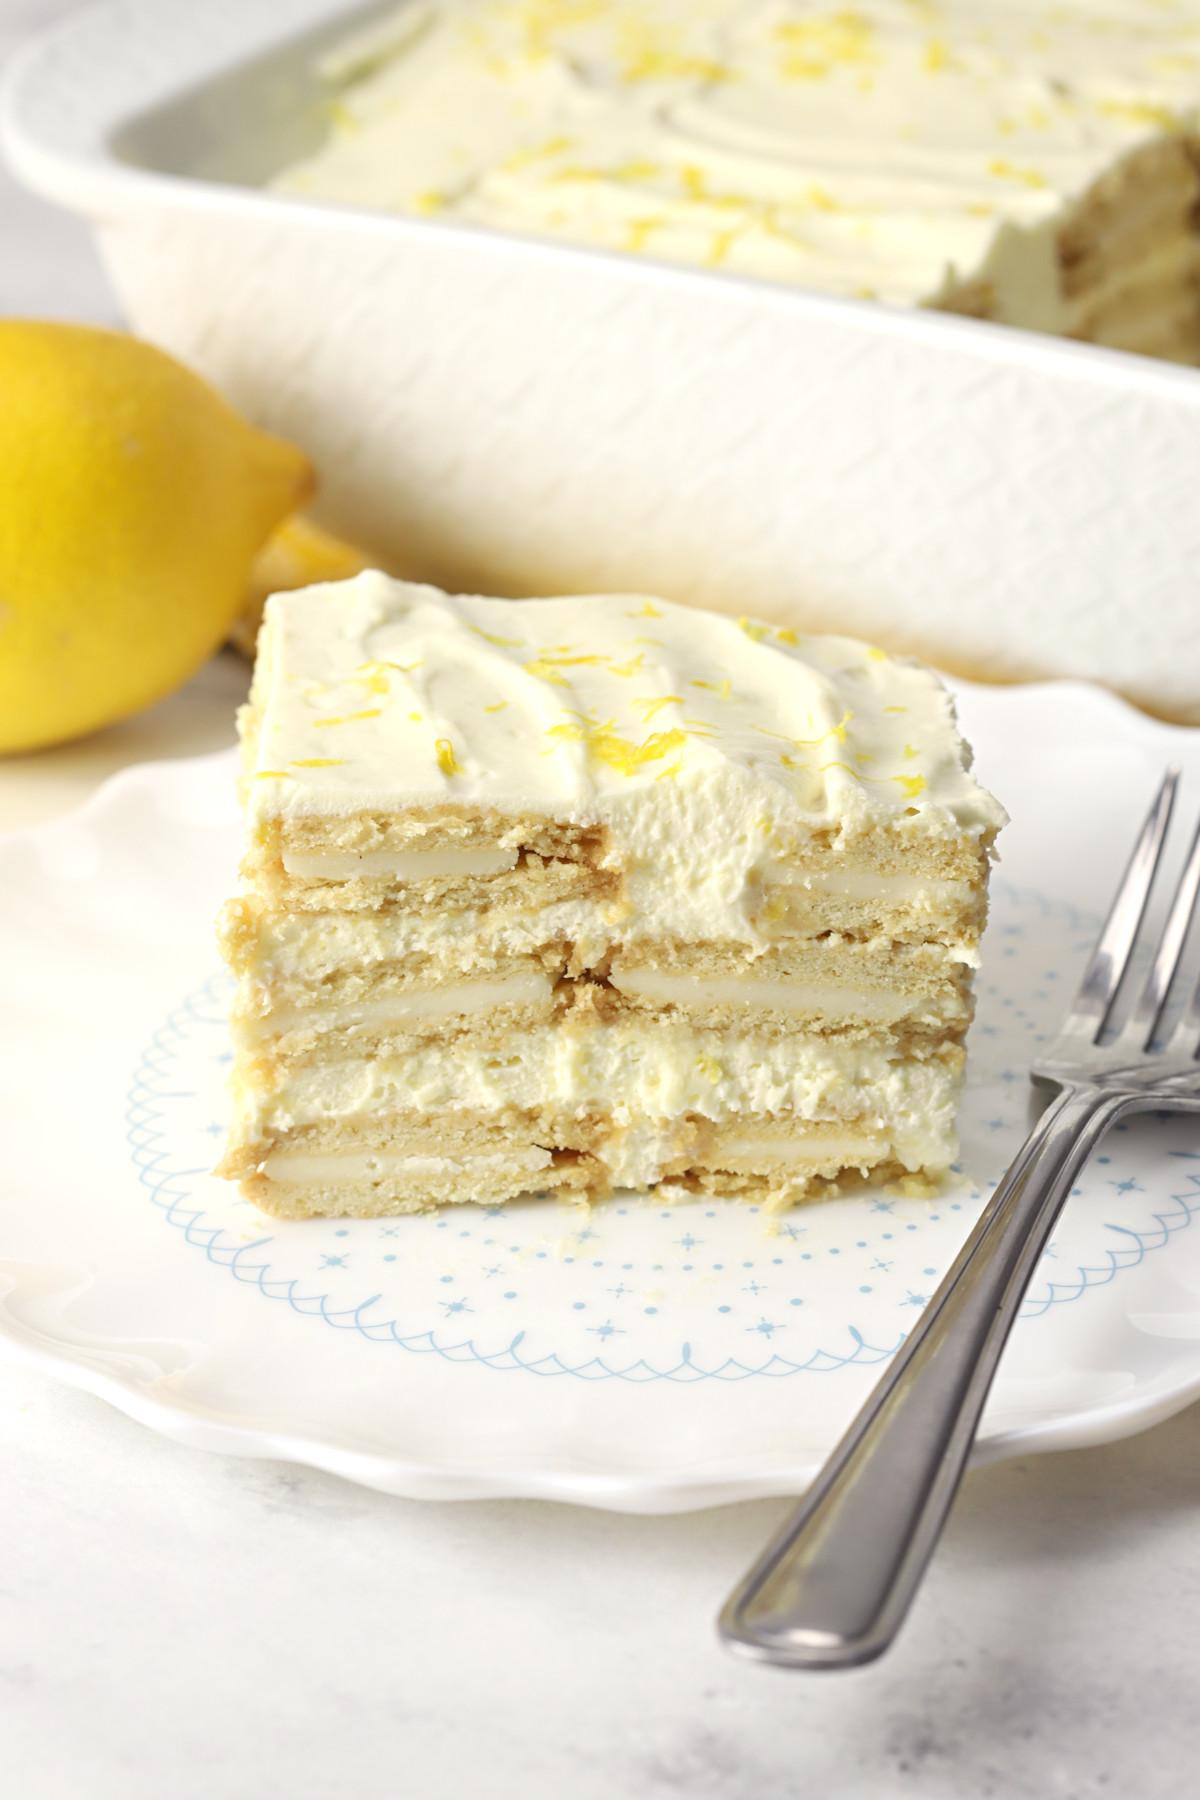 A slice of lemon icebox cake on a white dish.